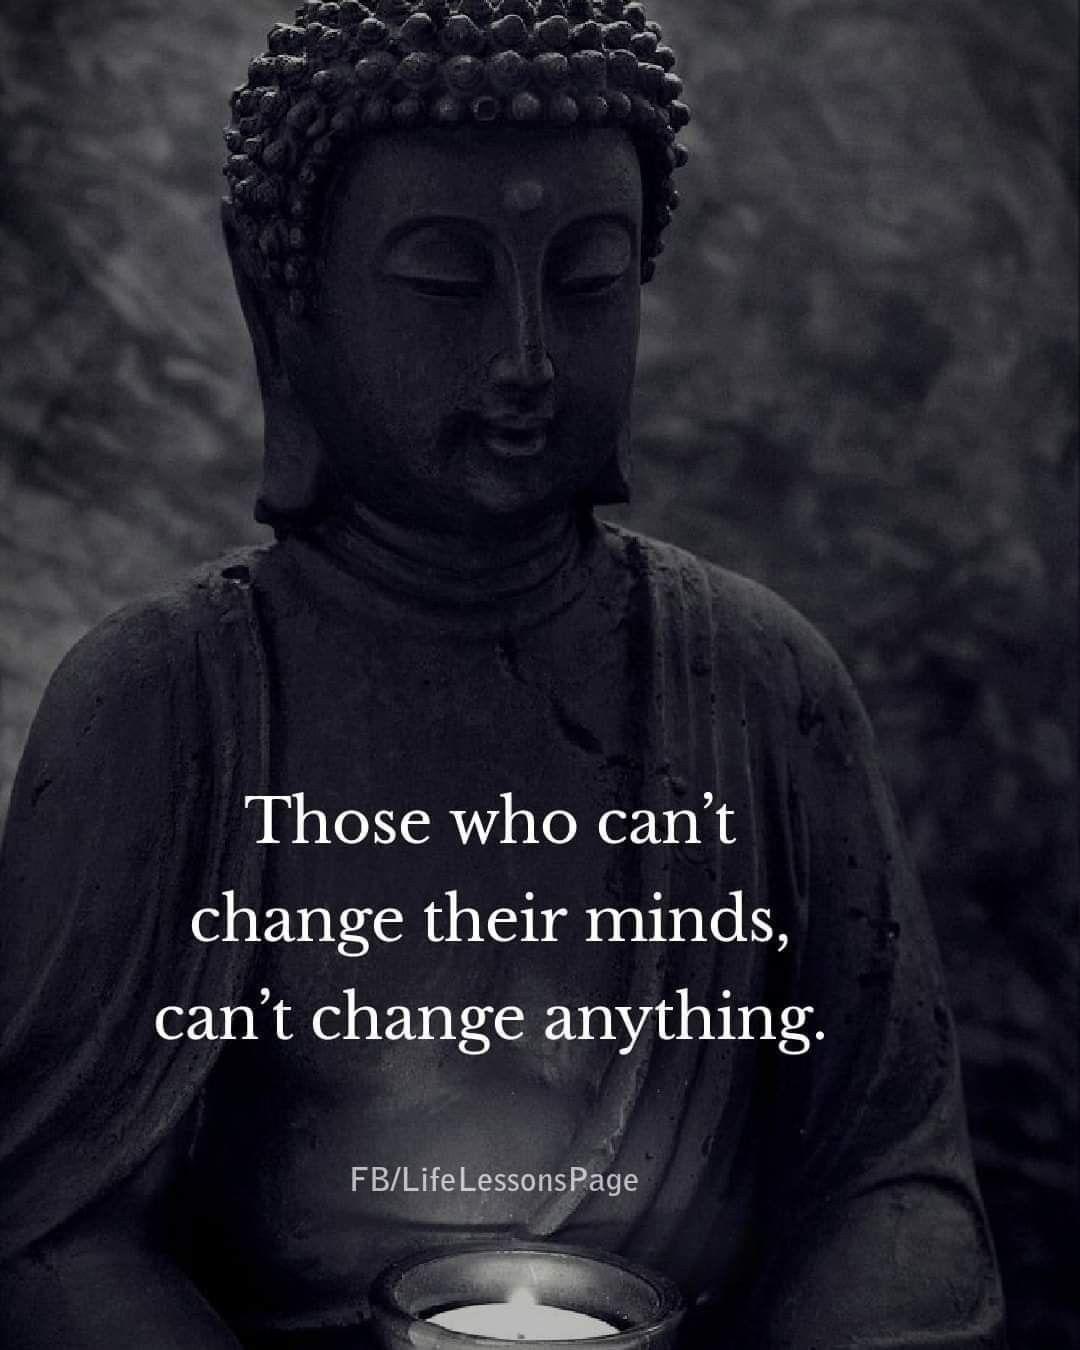 Pin by Pradeep Gangol on Buddha in 2020 Buddha quote